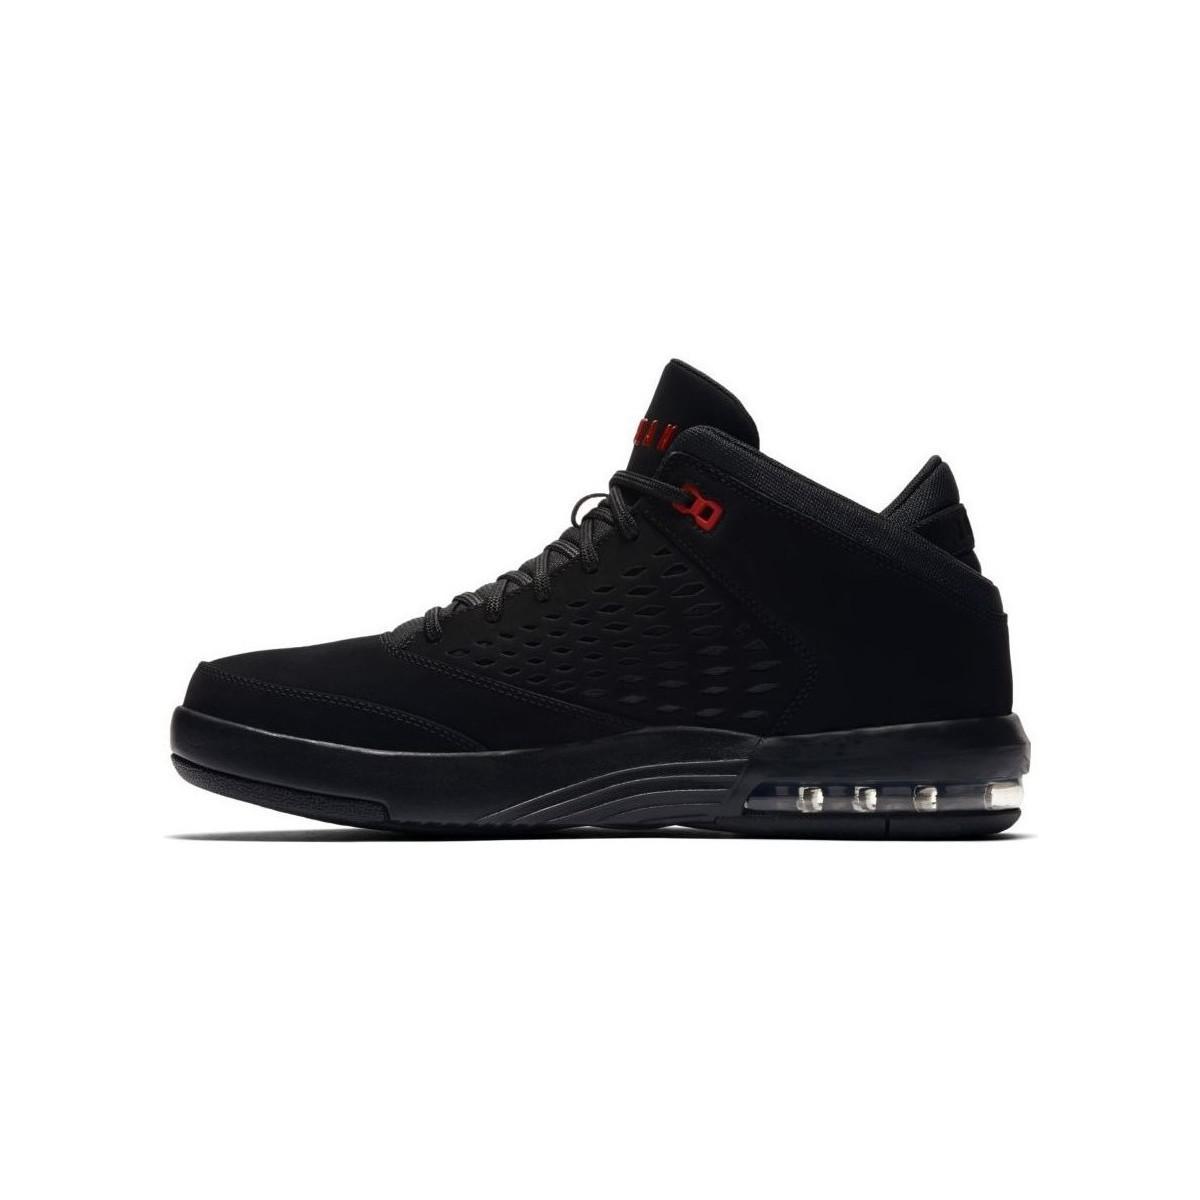 Air Jordan Flight Origin 4 hommes Chaussures en Noir Nike pour ...